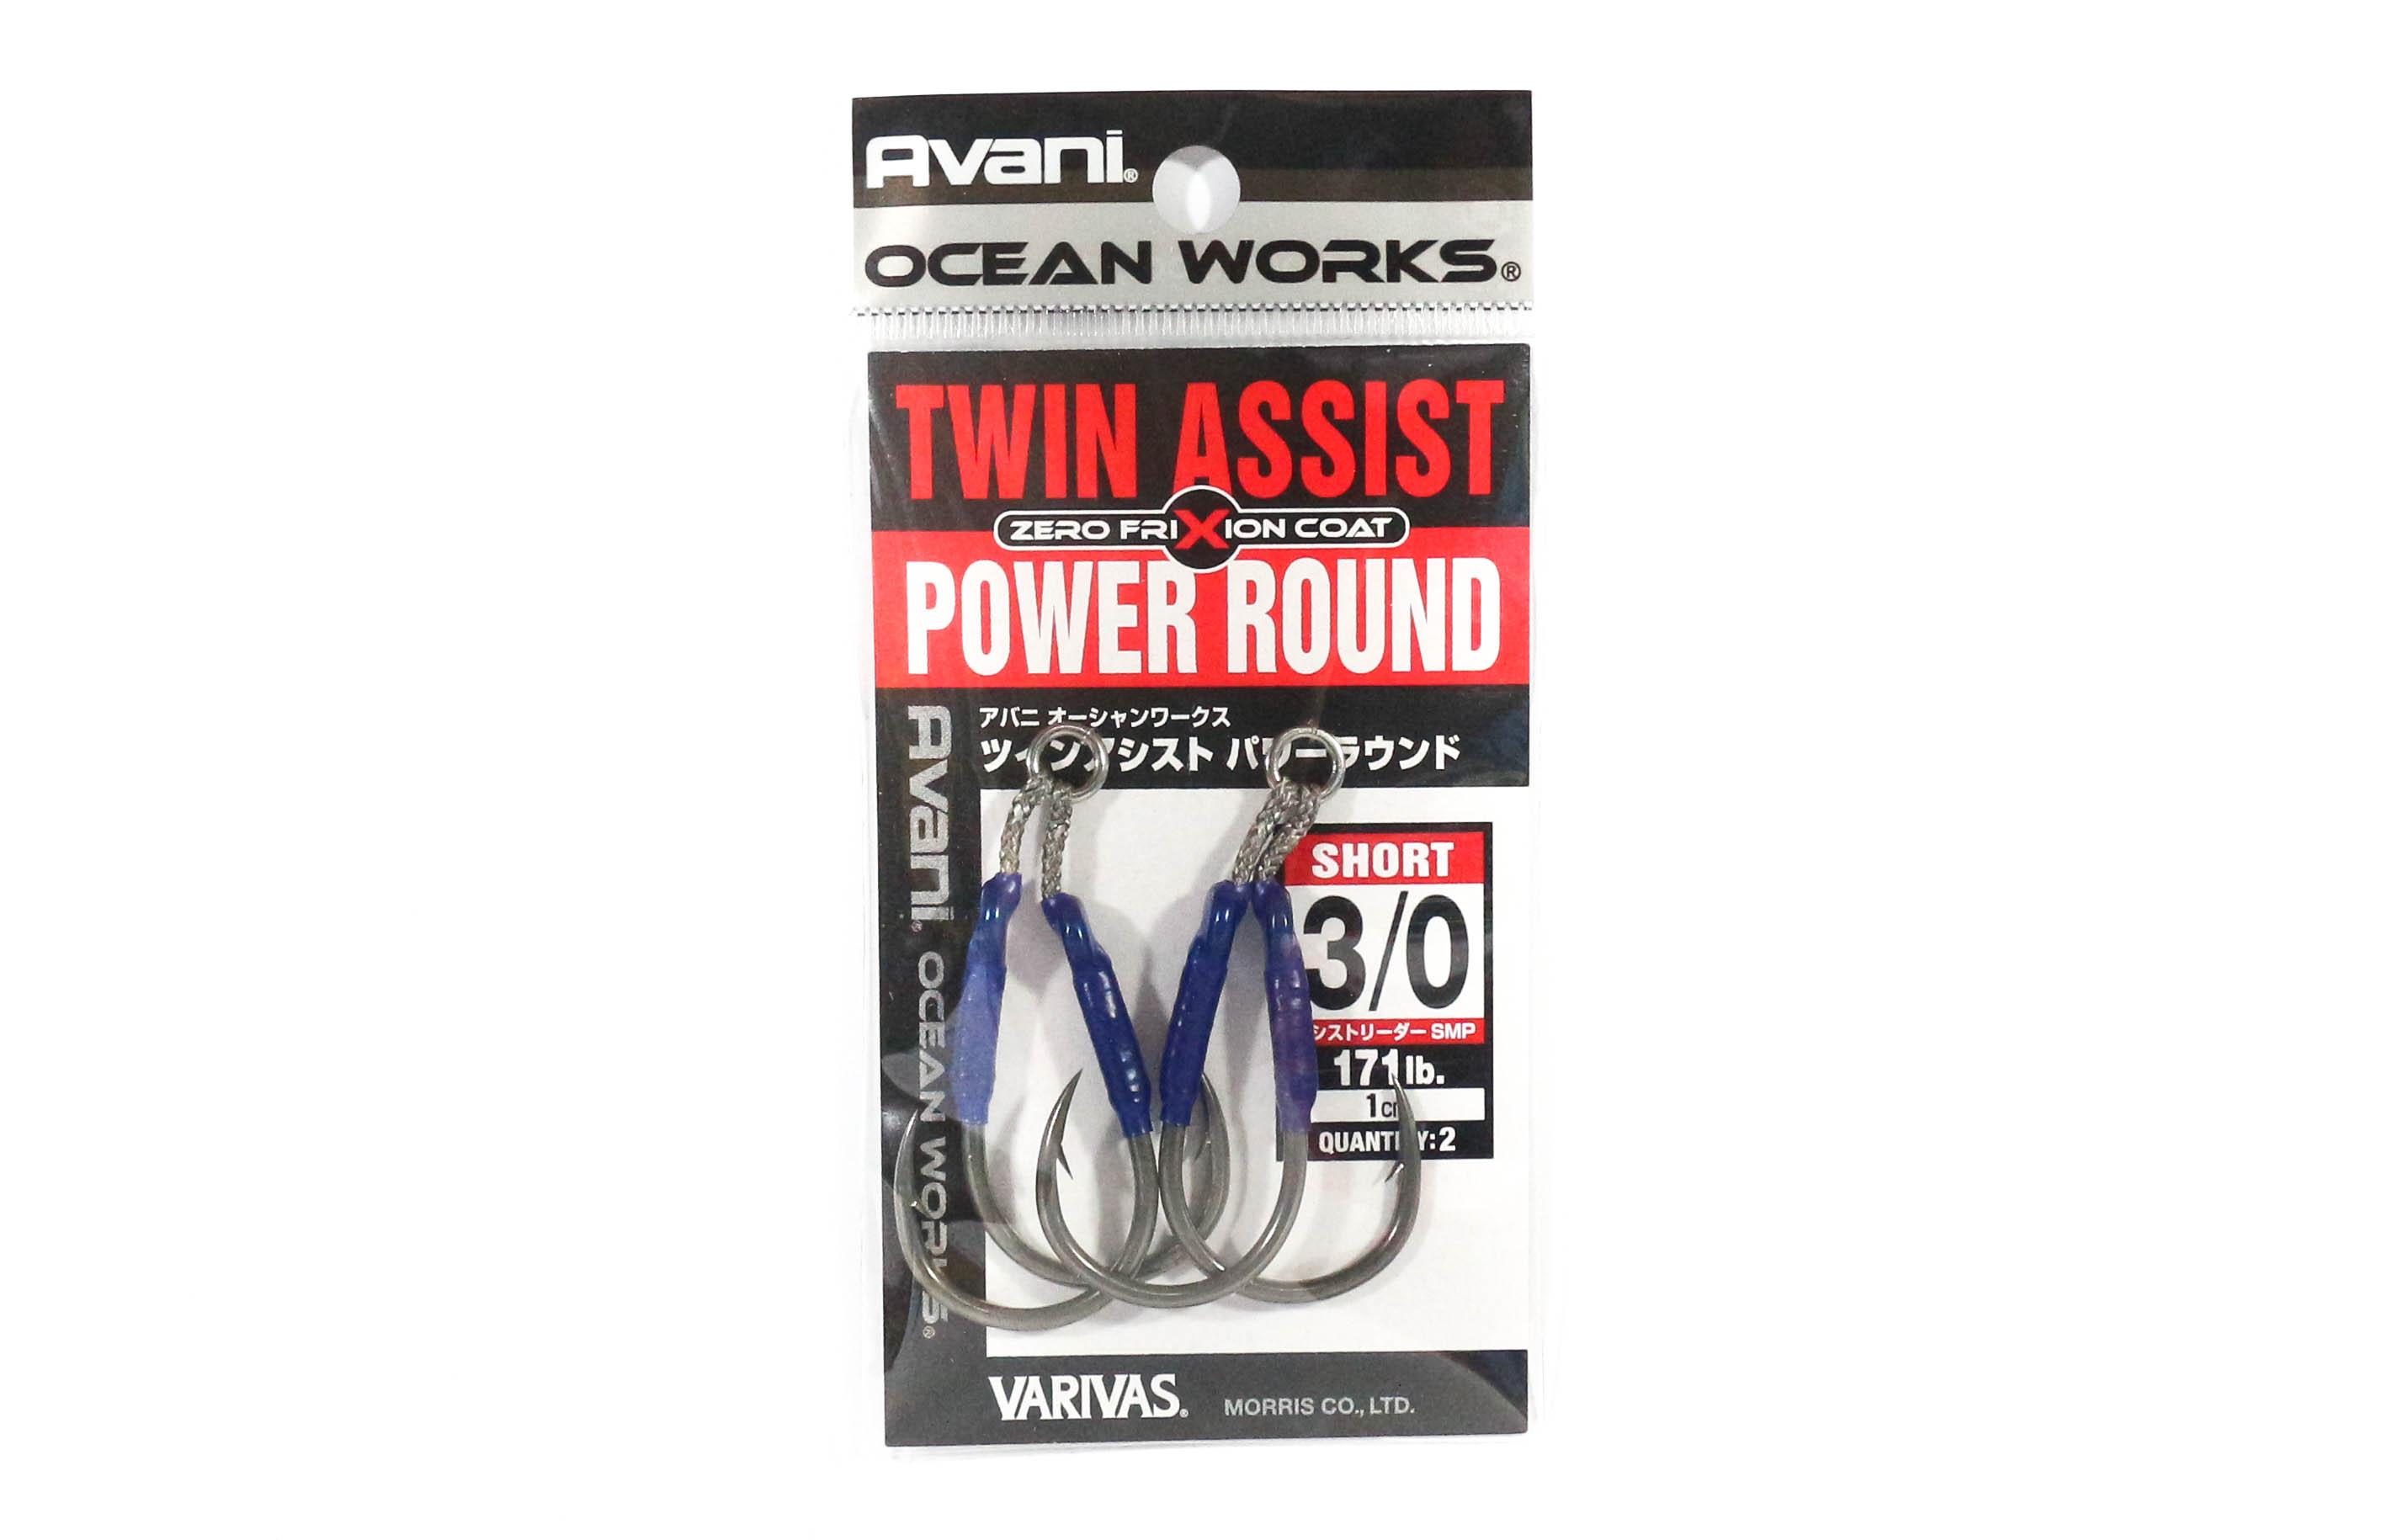 Varivas AH-50 Ocean Works Twin Assist Power Round Short Size 3/0 (4438)